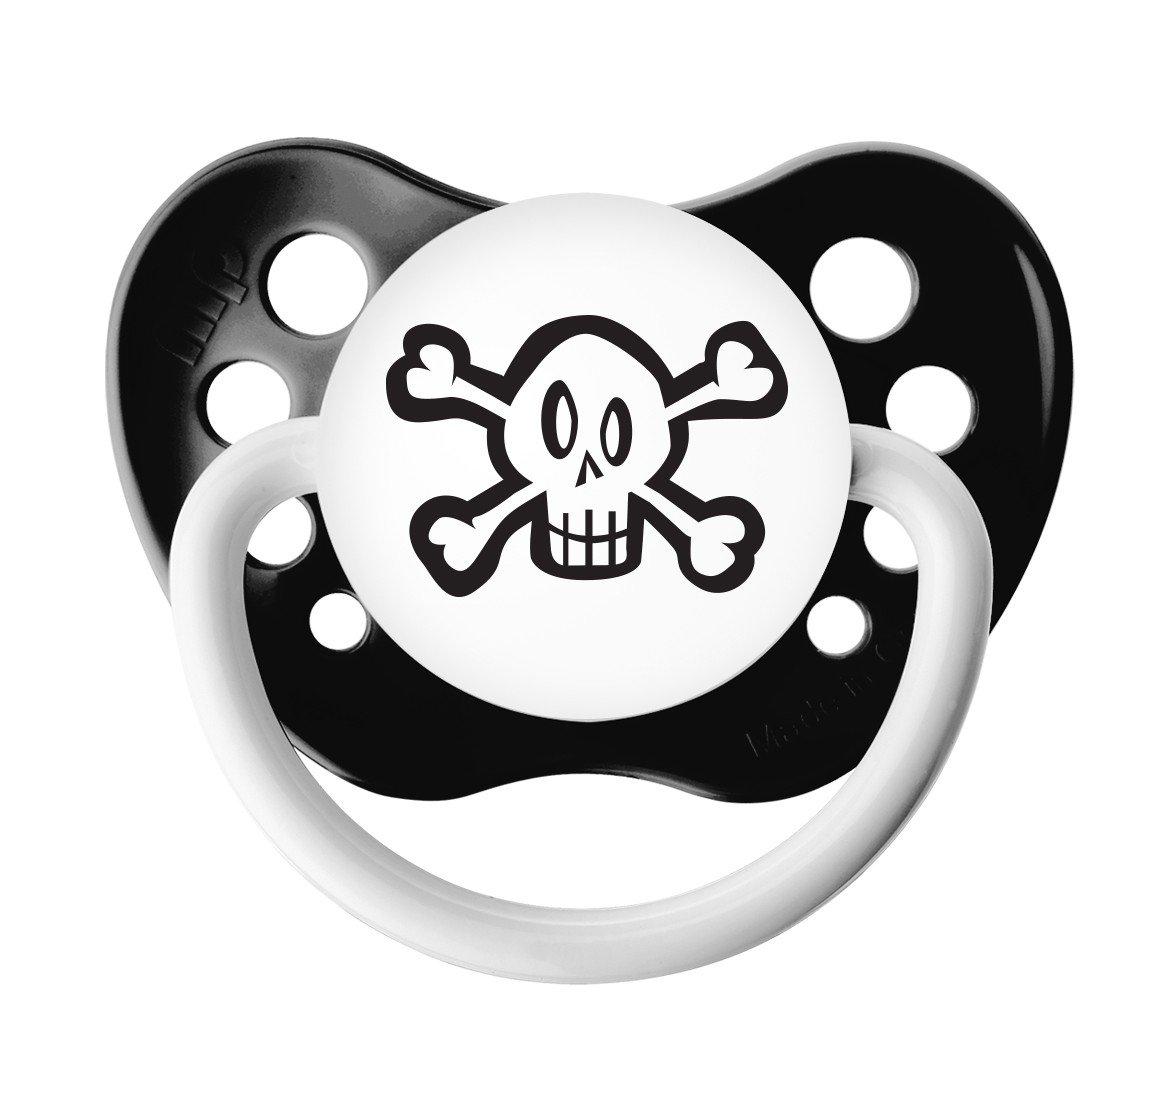 Skull Pacifier - Ulubulu - 0-6 months - Black - Unisex - Skull and Crossbones Binky